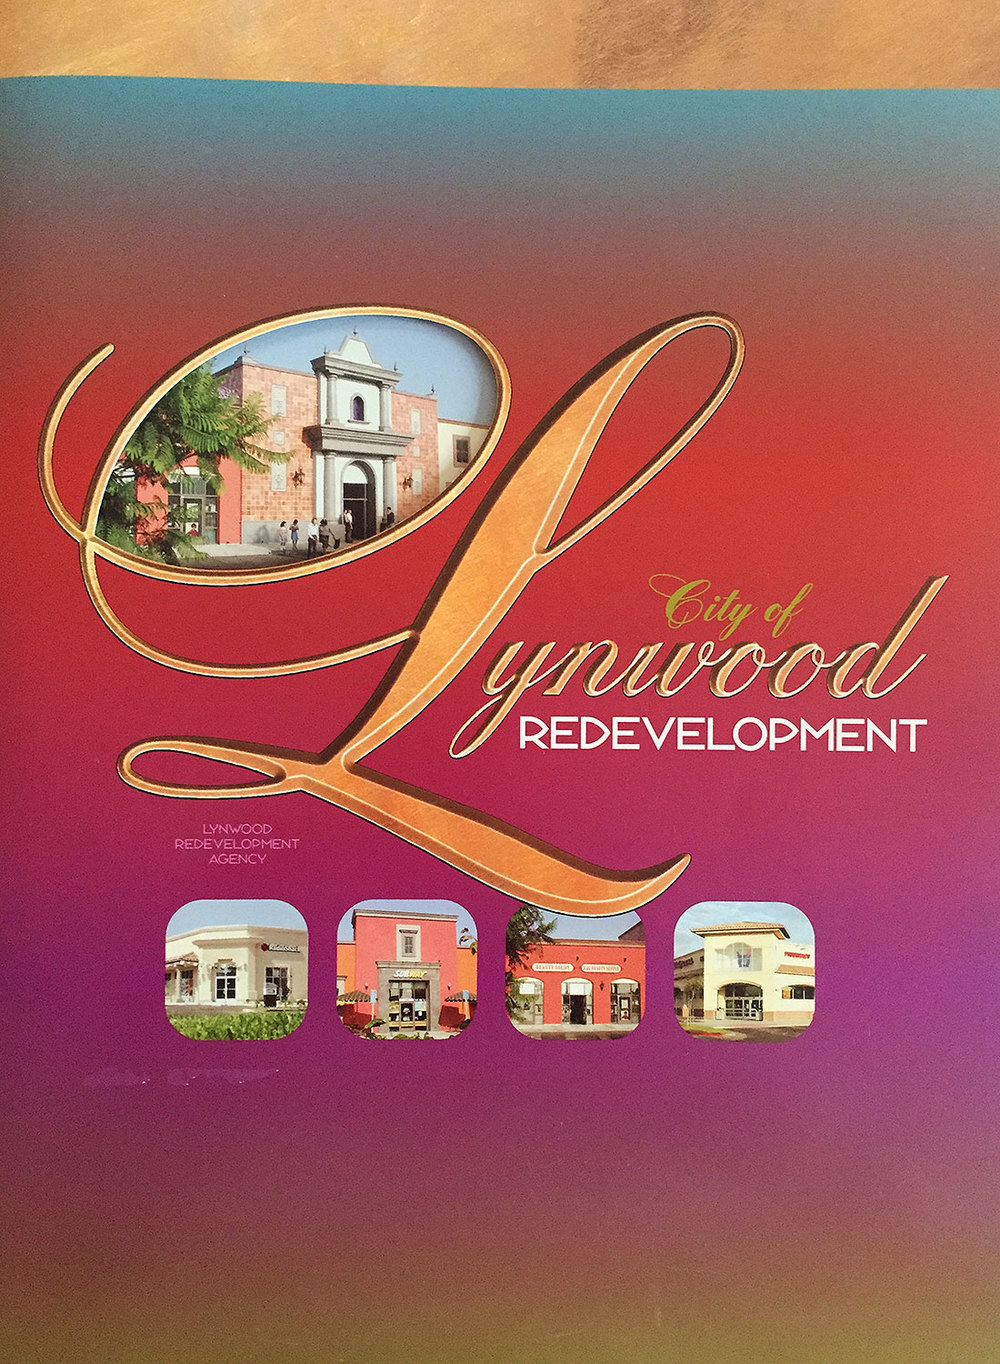 lyndwood01.jpg